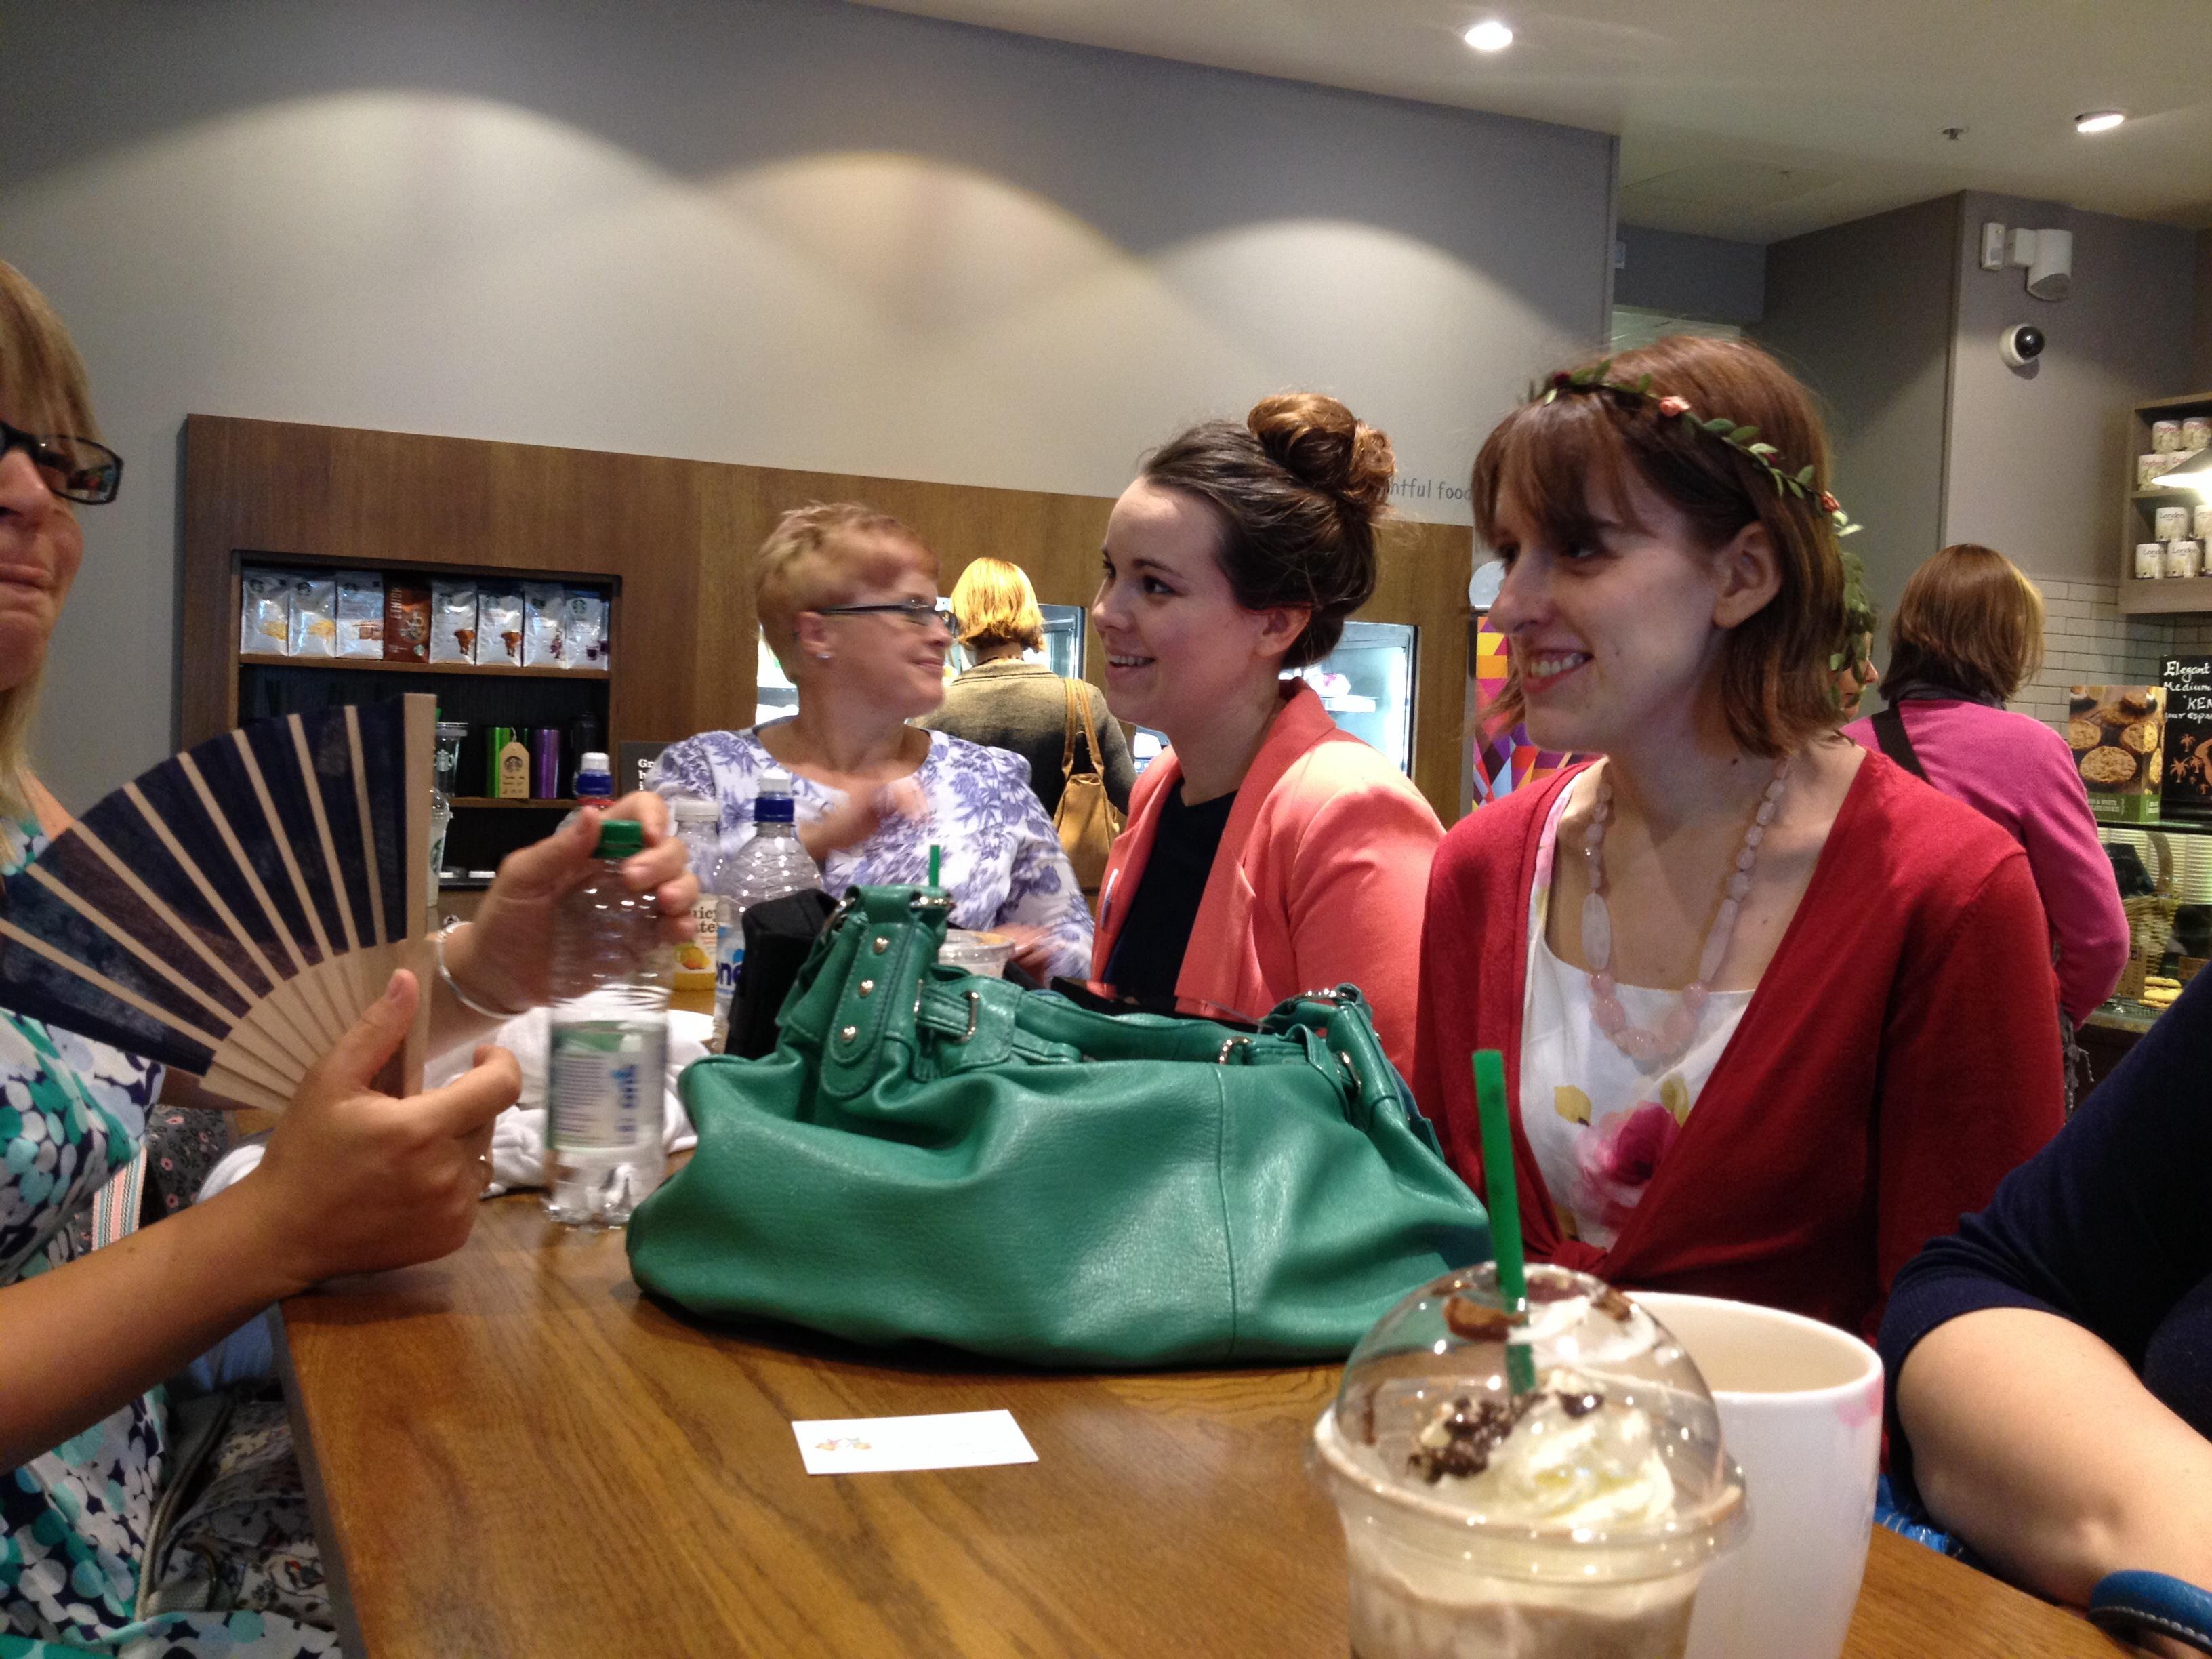 Starbucks Finsbury Square London BritMums Live! meet up 2014